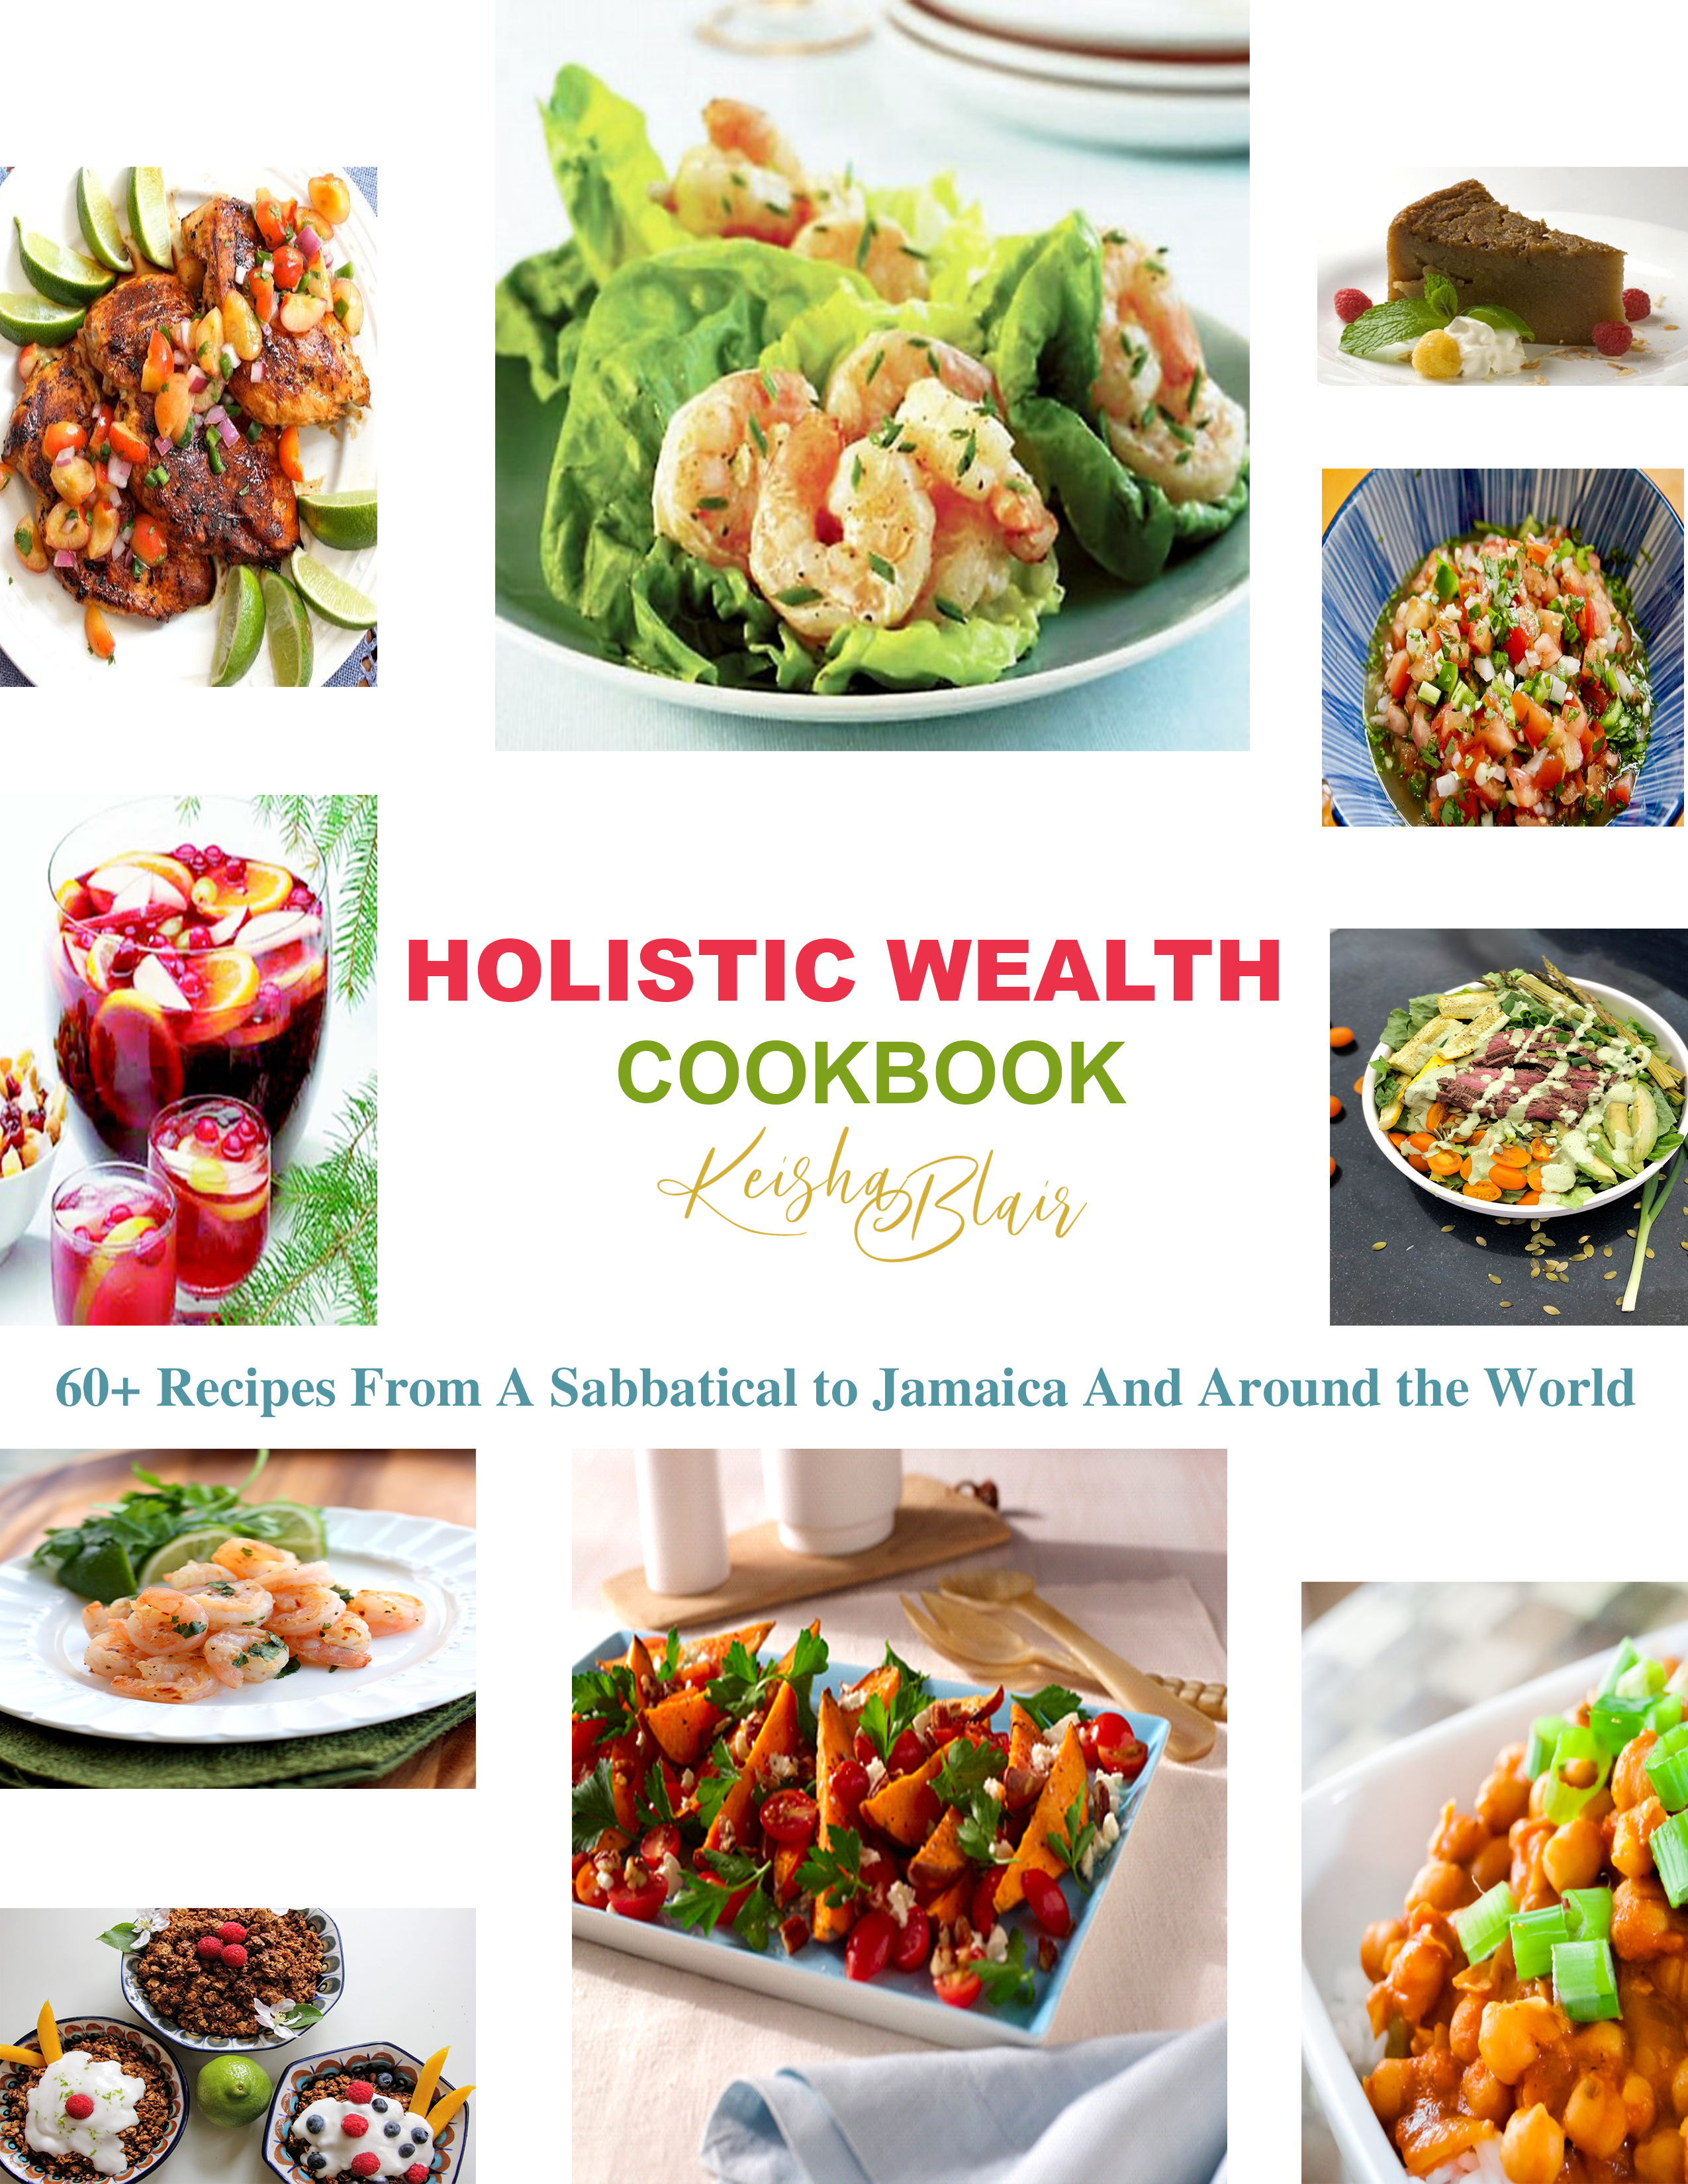 The Holistic Wealth Cookbook